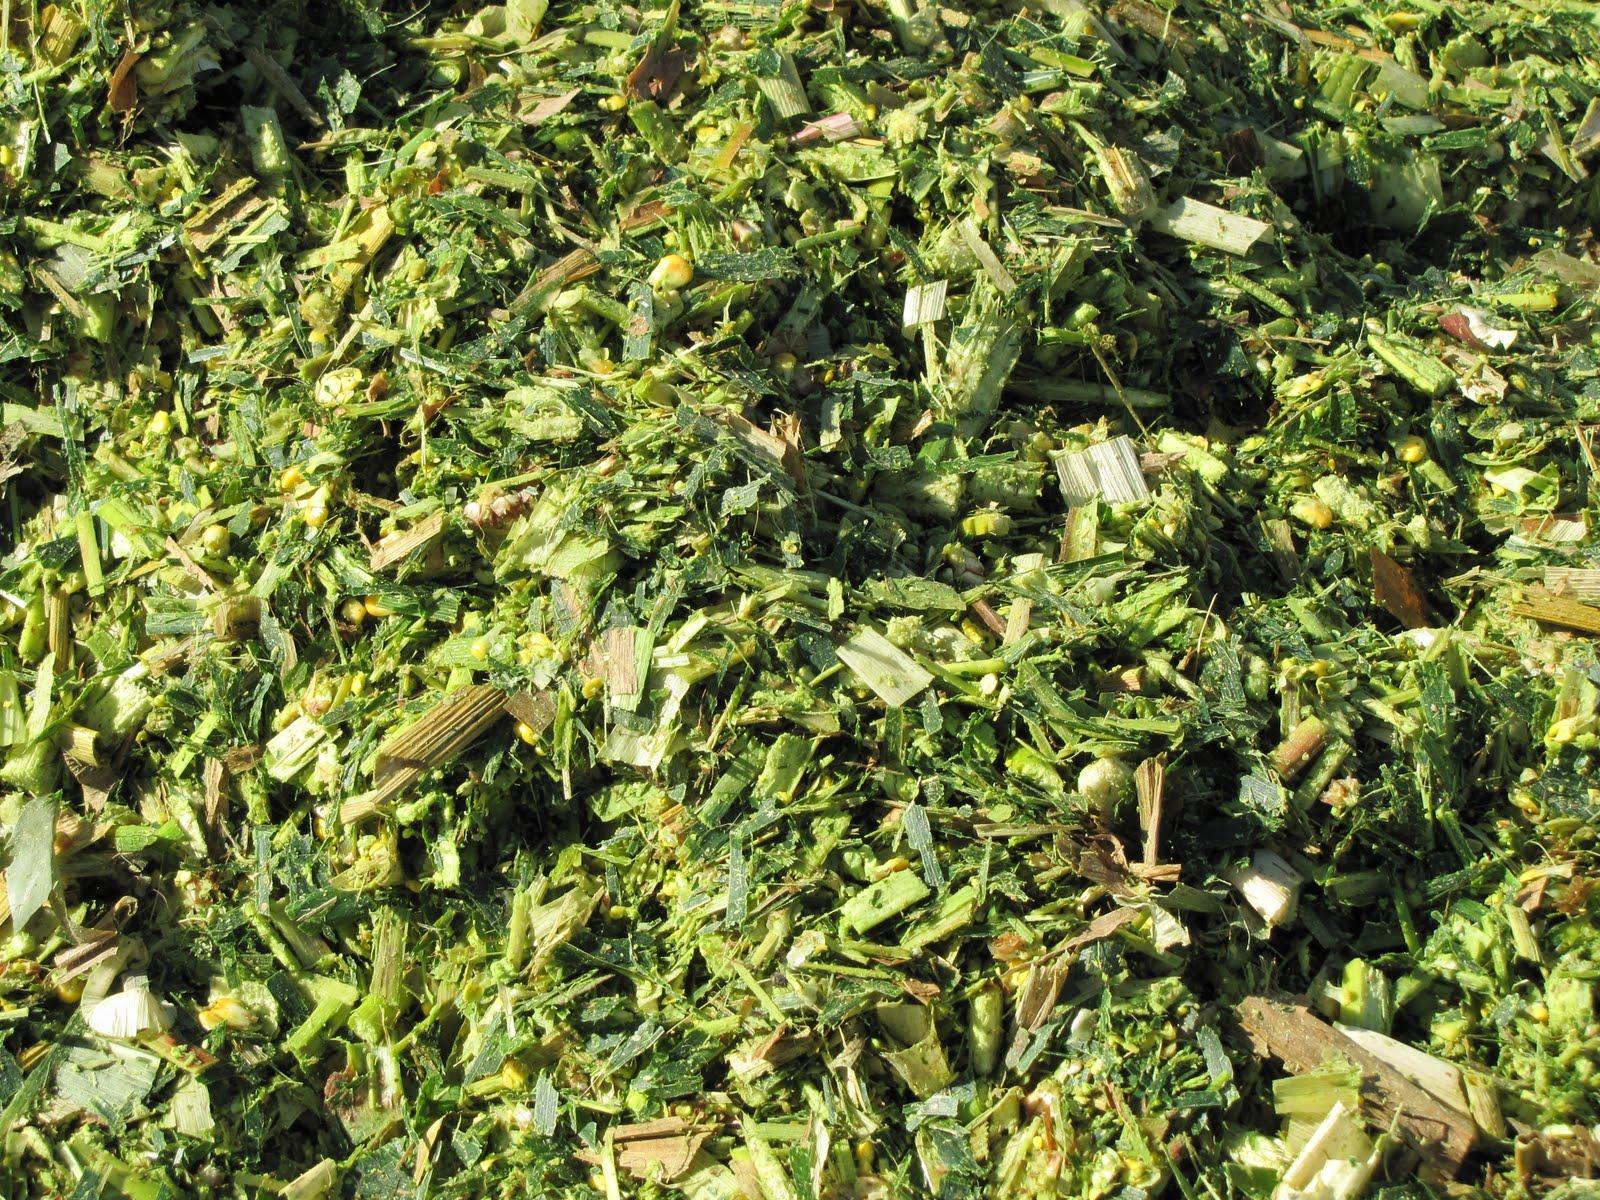 Clinker Picture Of Corn : Cornstalk pellet agrowaste hx